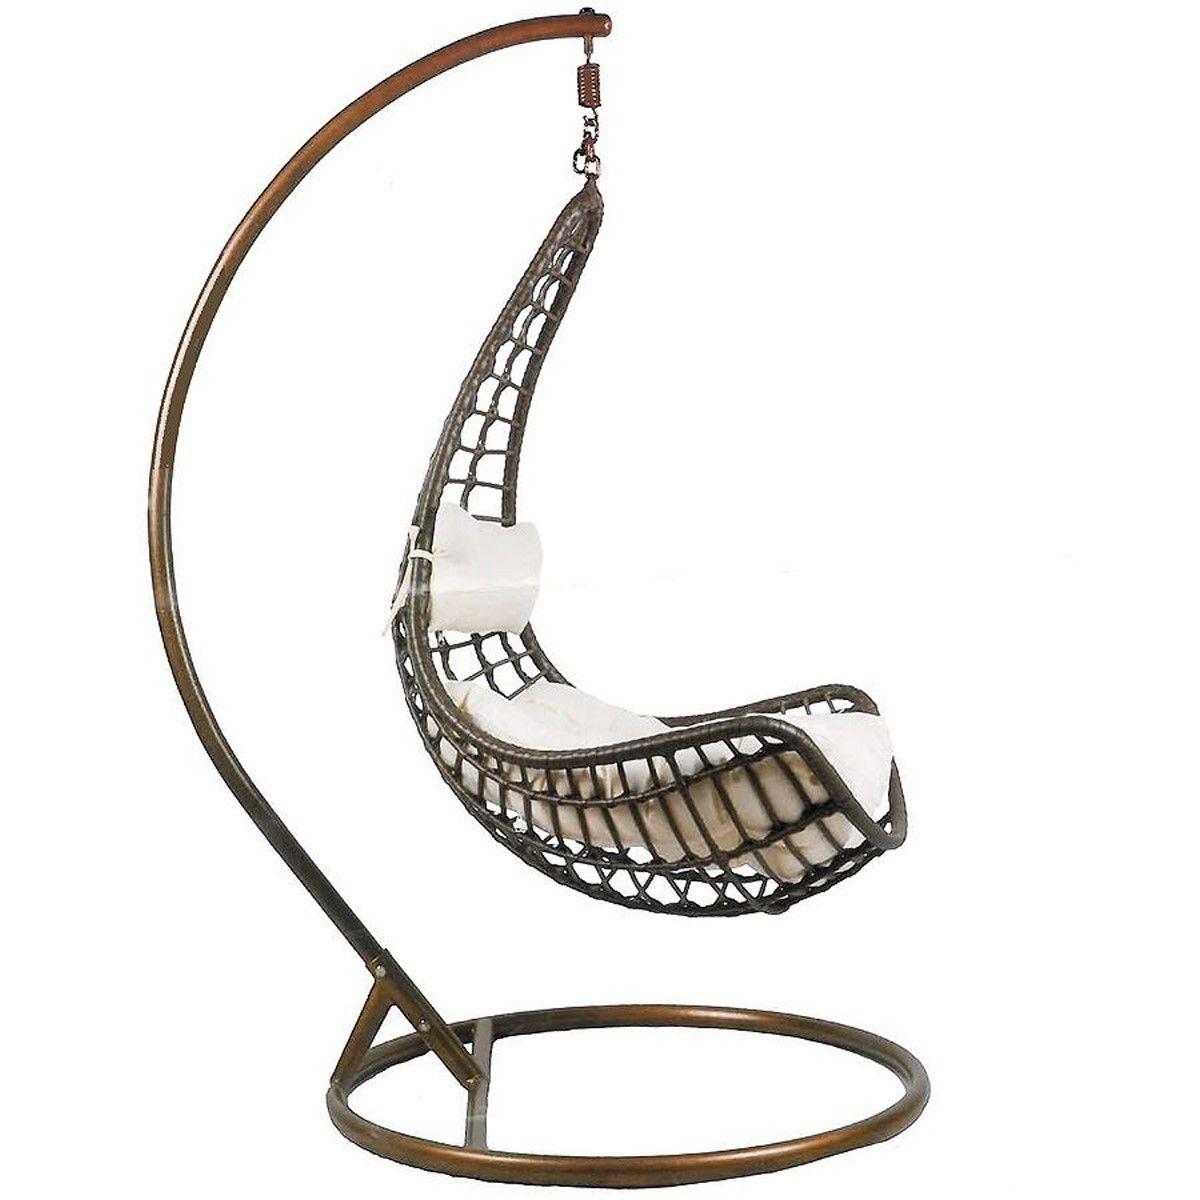 design hängesessel inkl. 2 kissen + gestell hängestuhl lounge